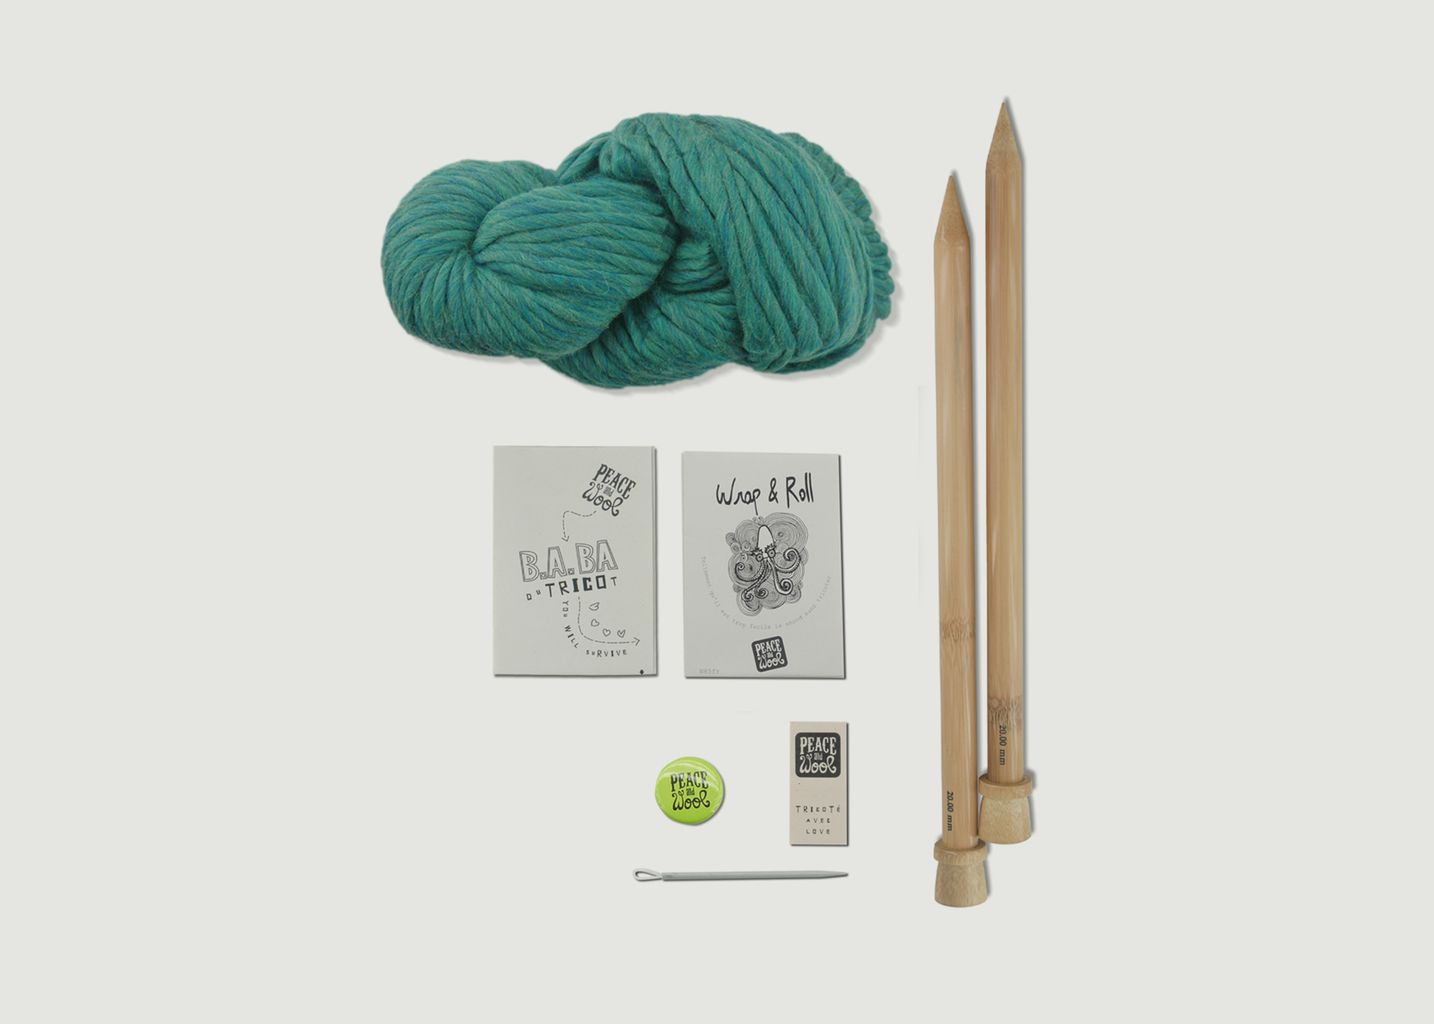 Blanc Bonnet & Bonnet Blanc  - Peace and Wool